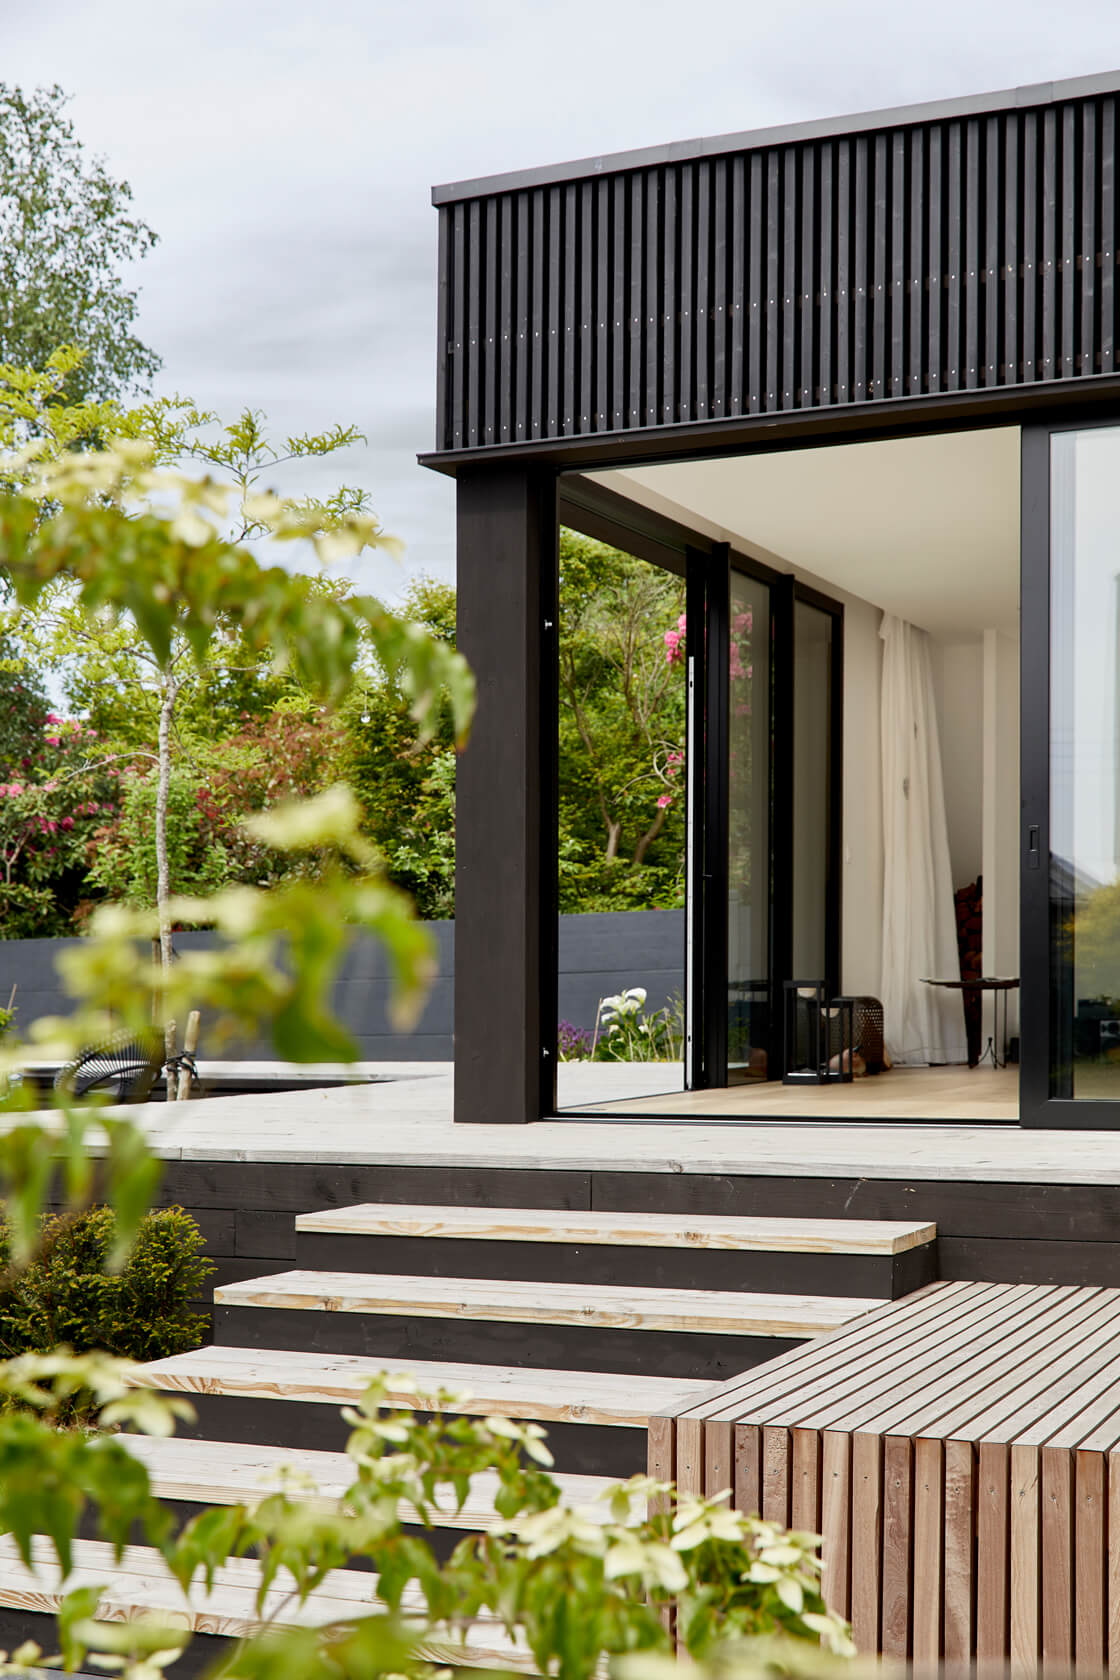 Jardins contemporains Archives - Hugo Campion